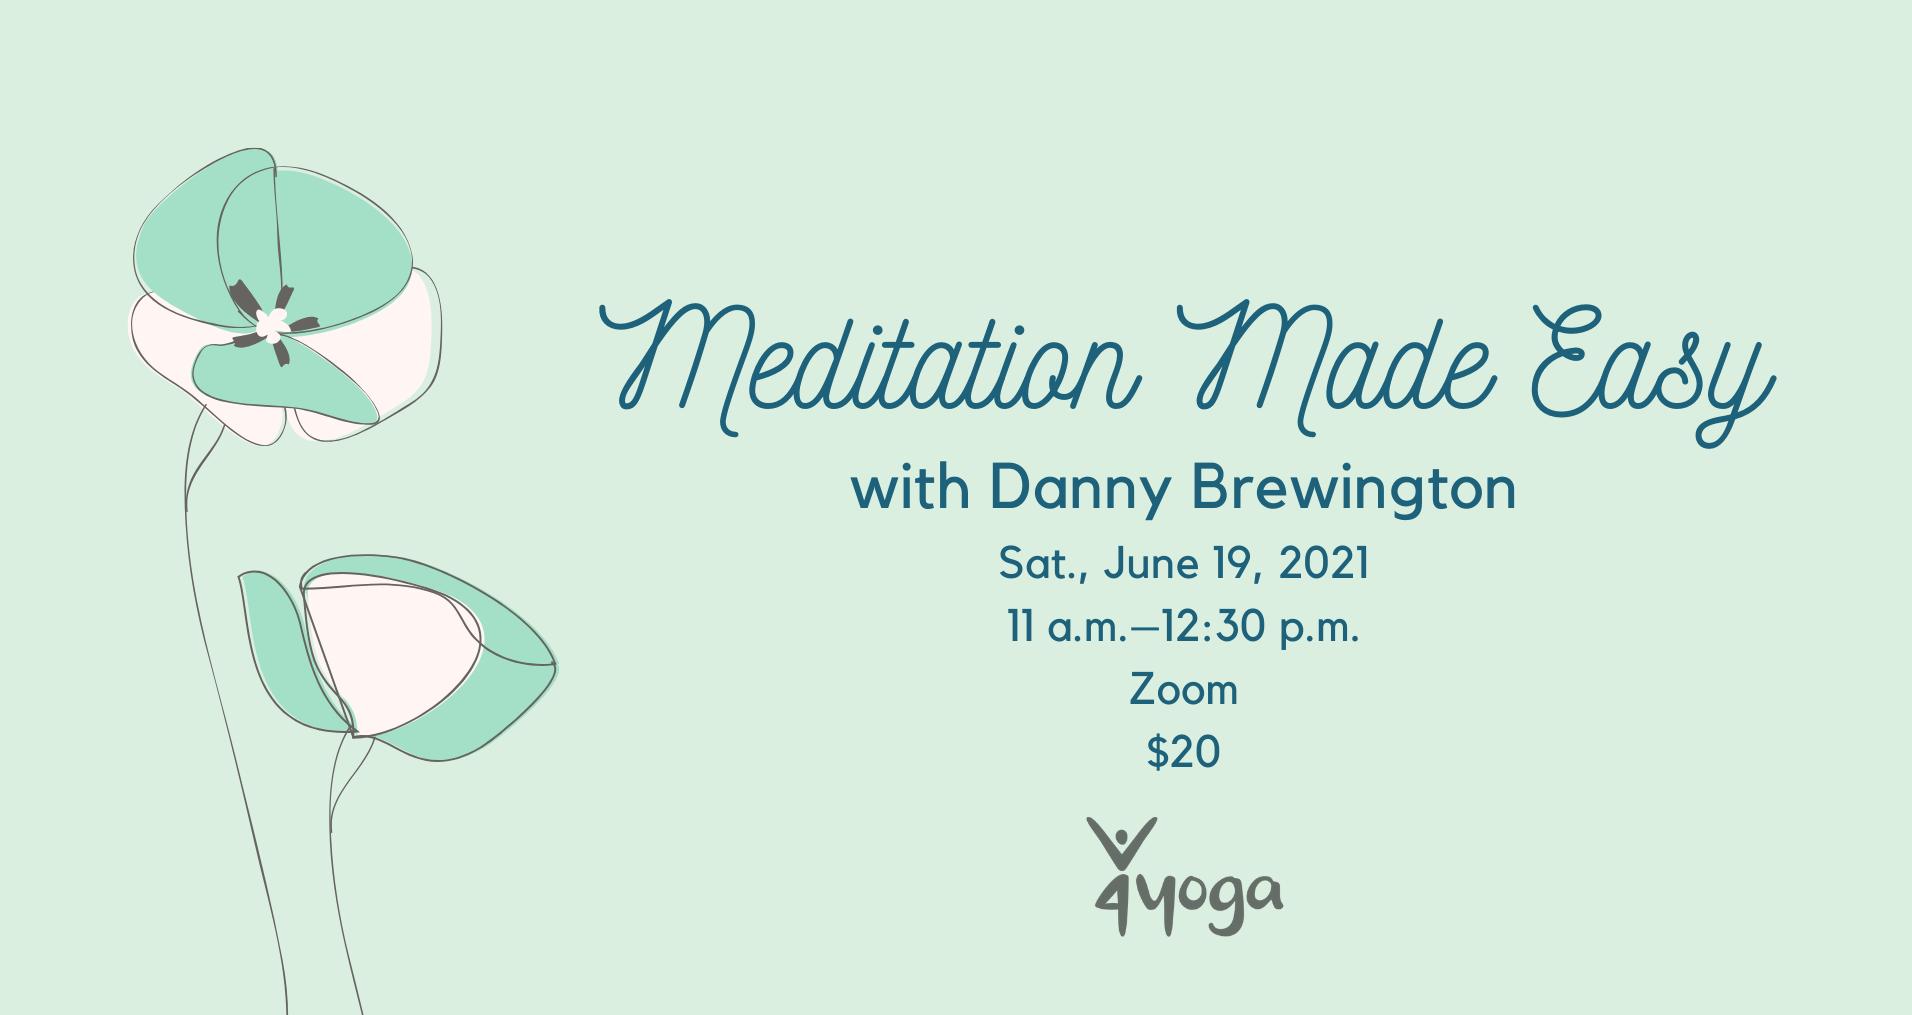 graphic advertising meditation workshop